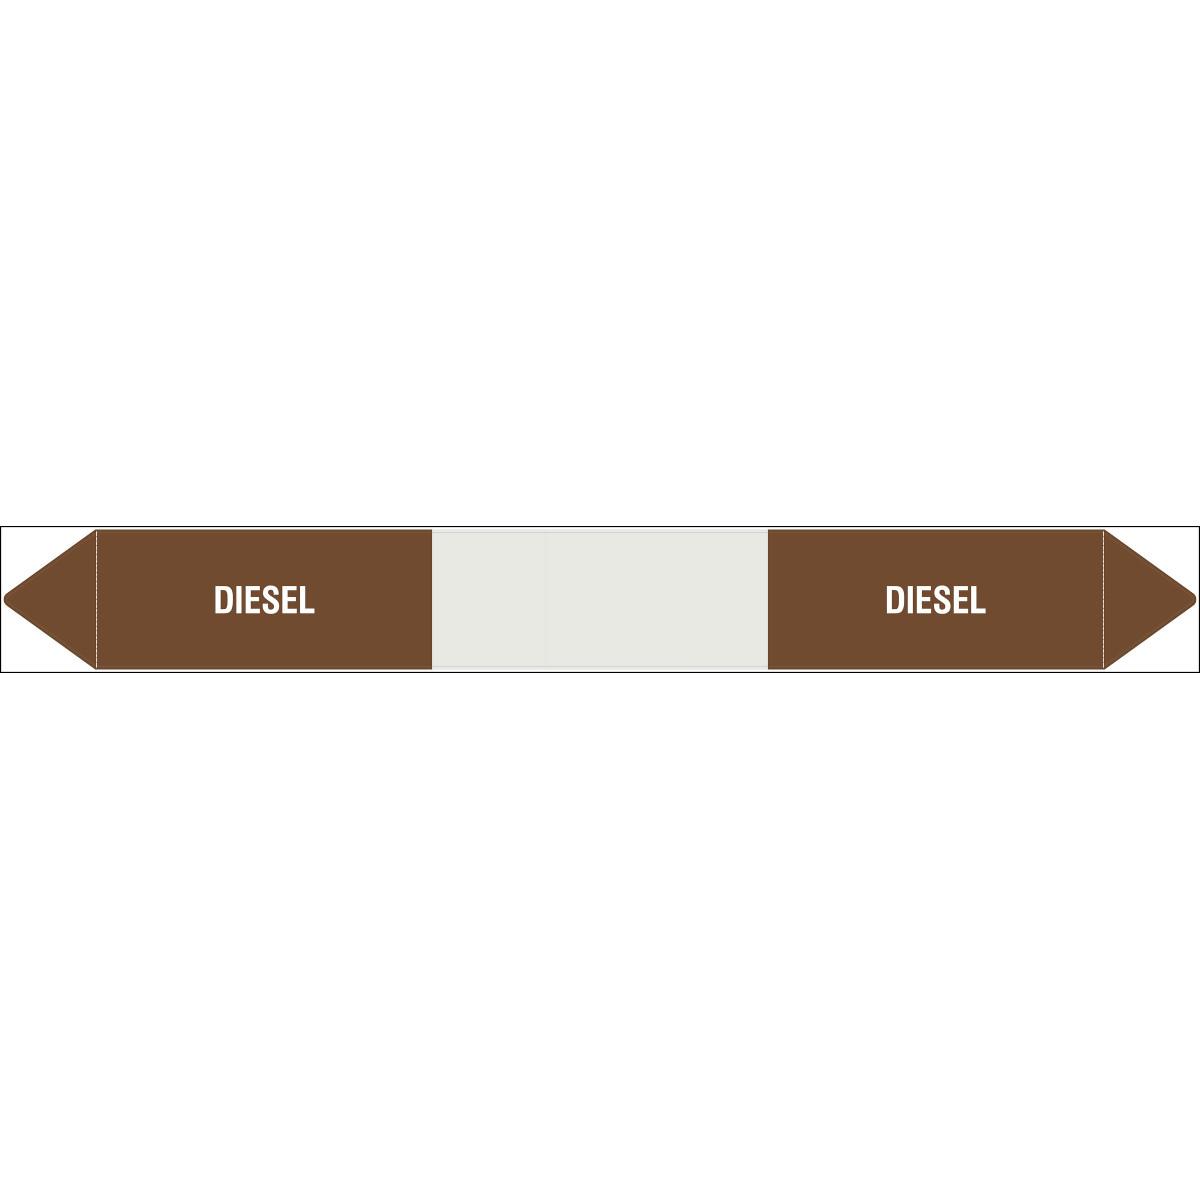 Combustible Liquids - Individual Peel Off Markers